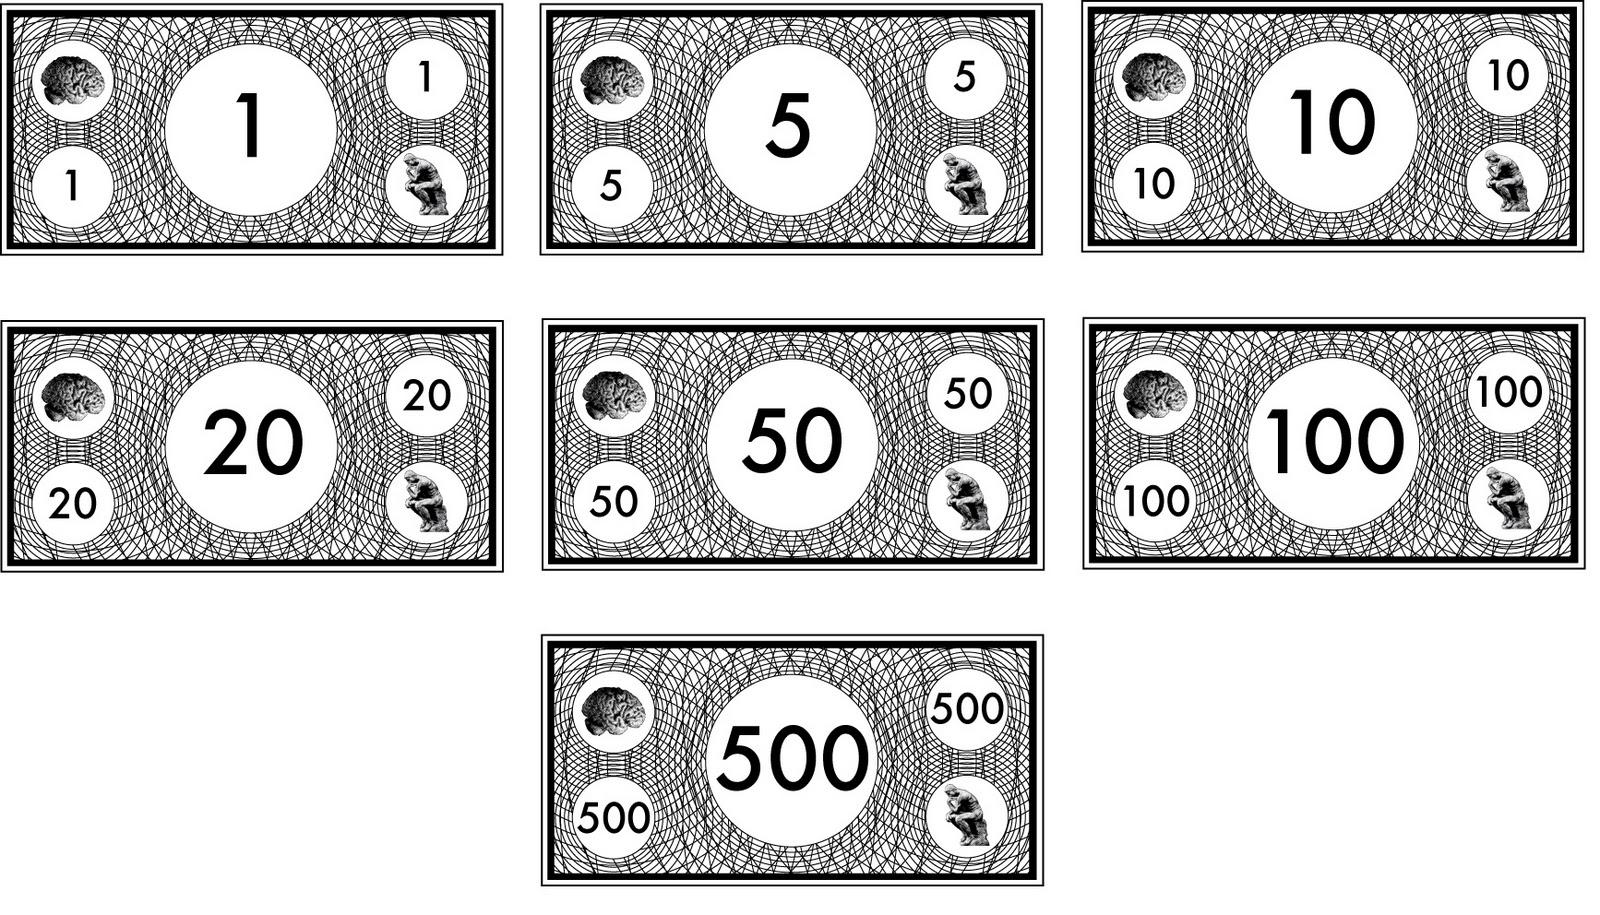 Design practice final money design for Monopoly money templates